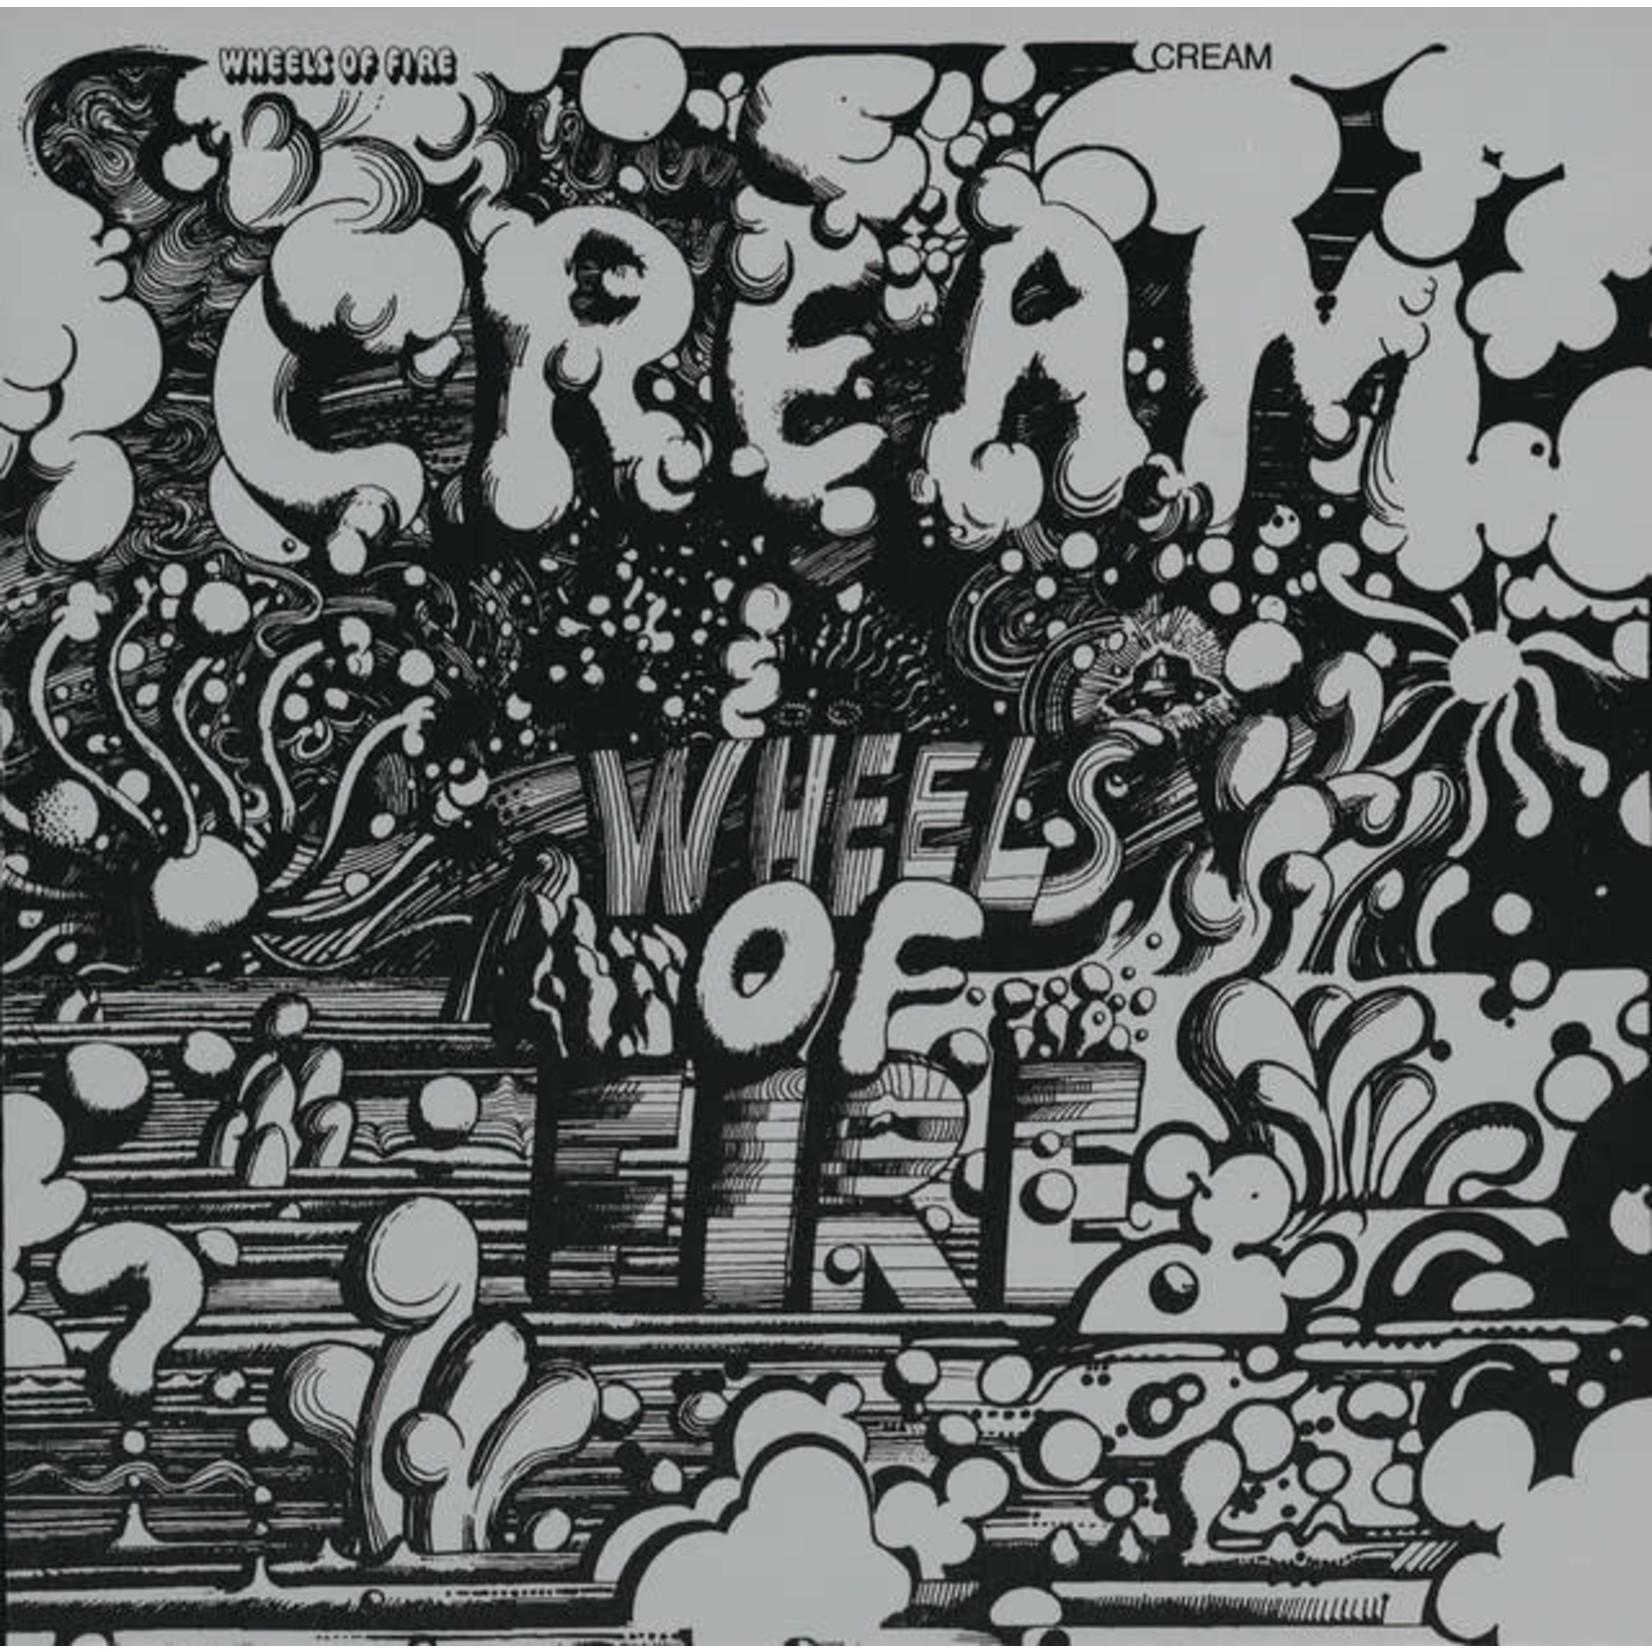 Vinyl Cream - Wheels Of Fire